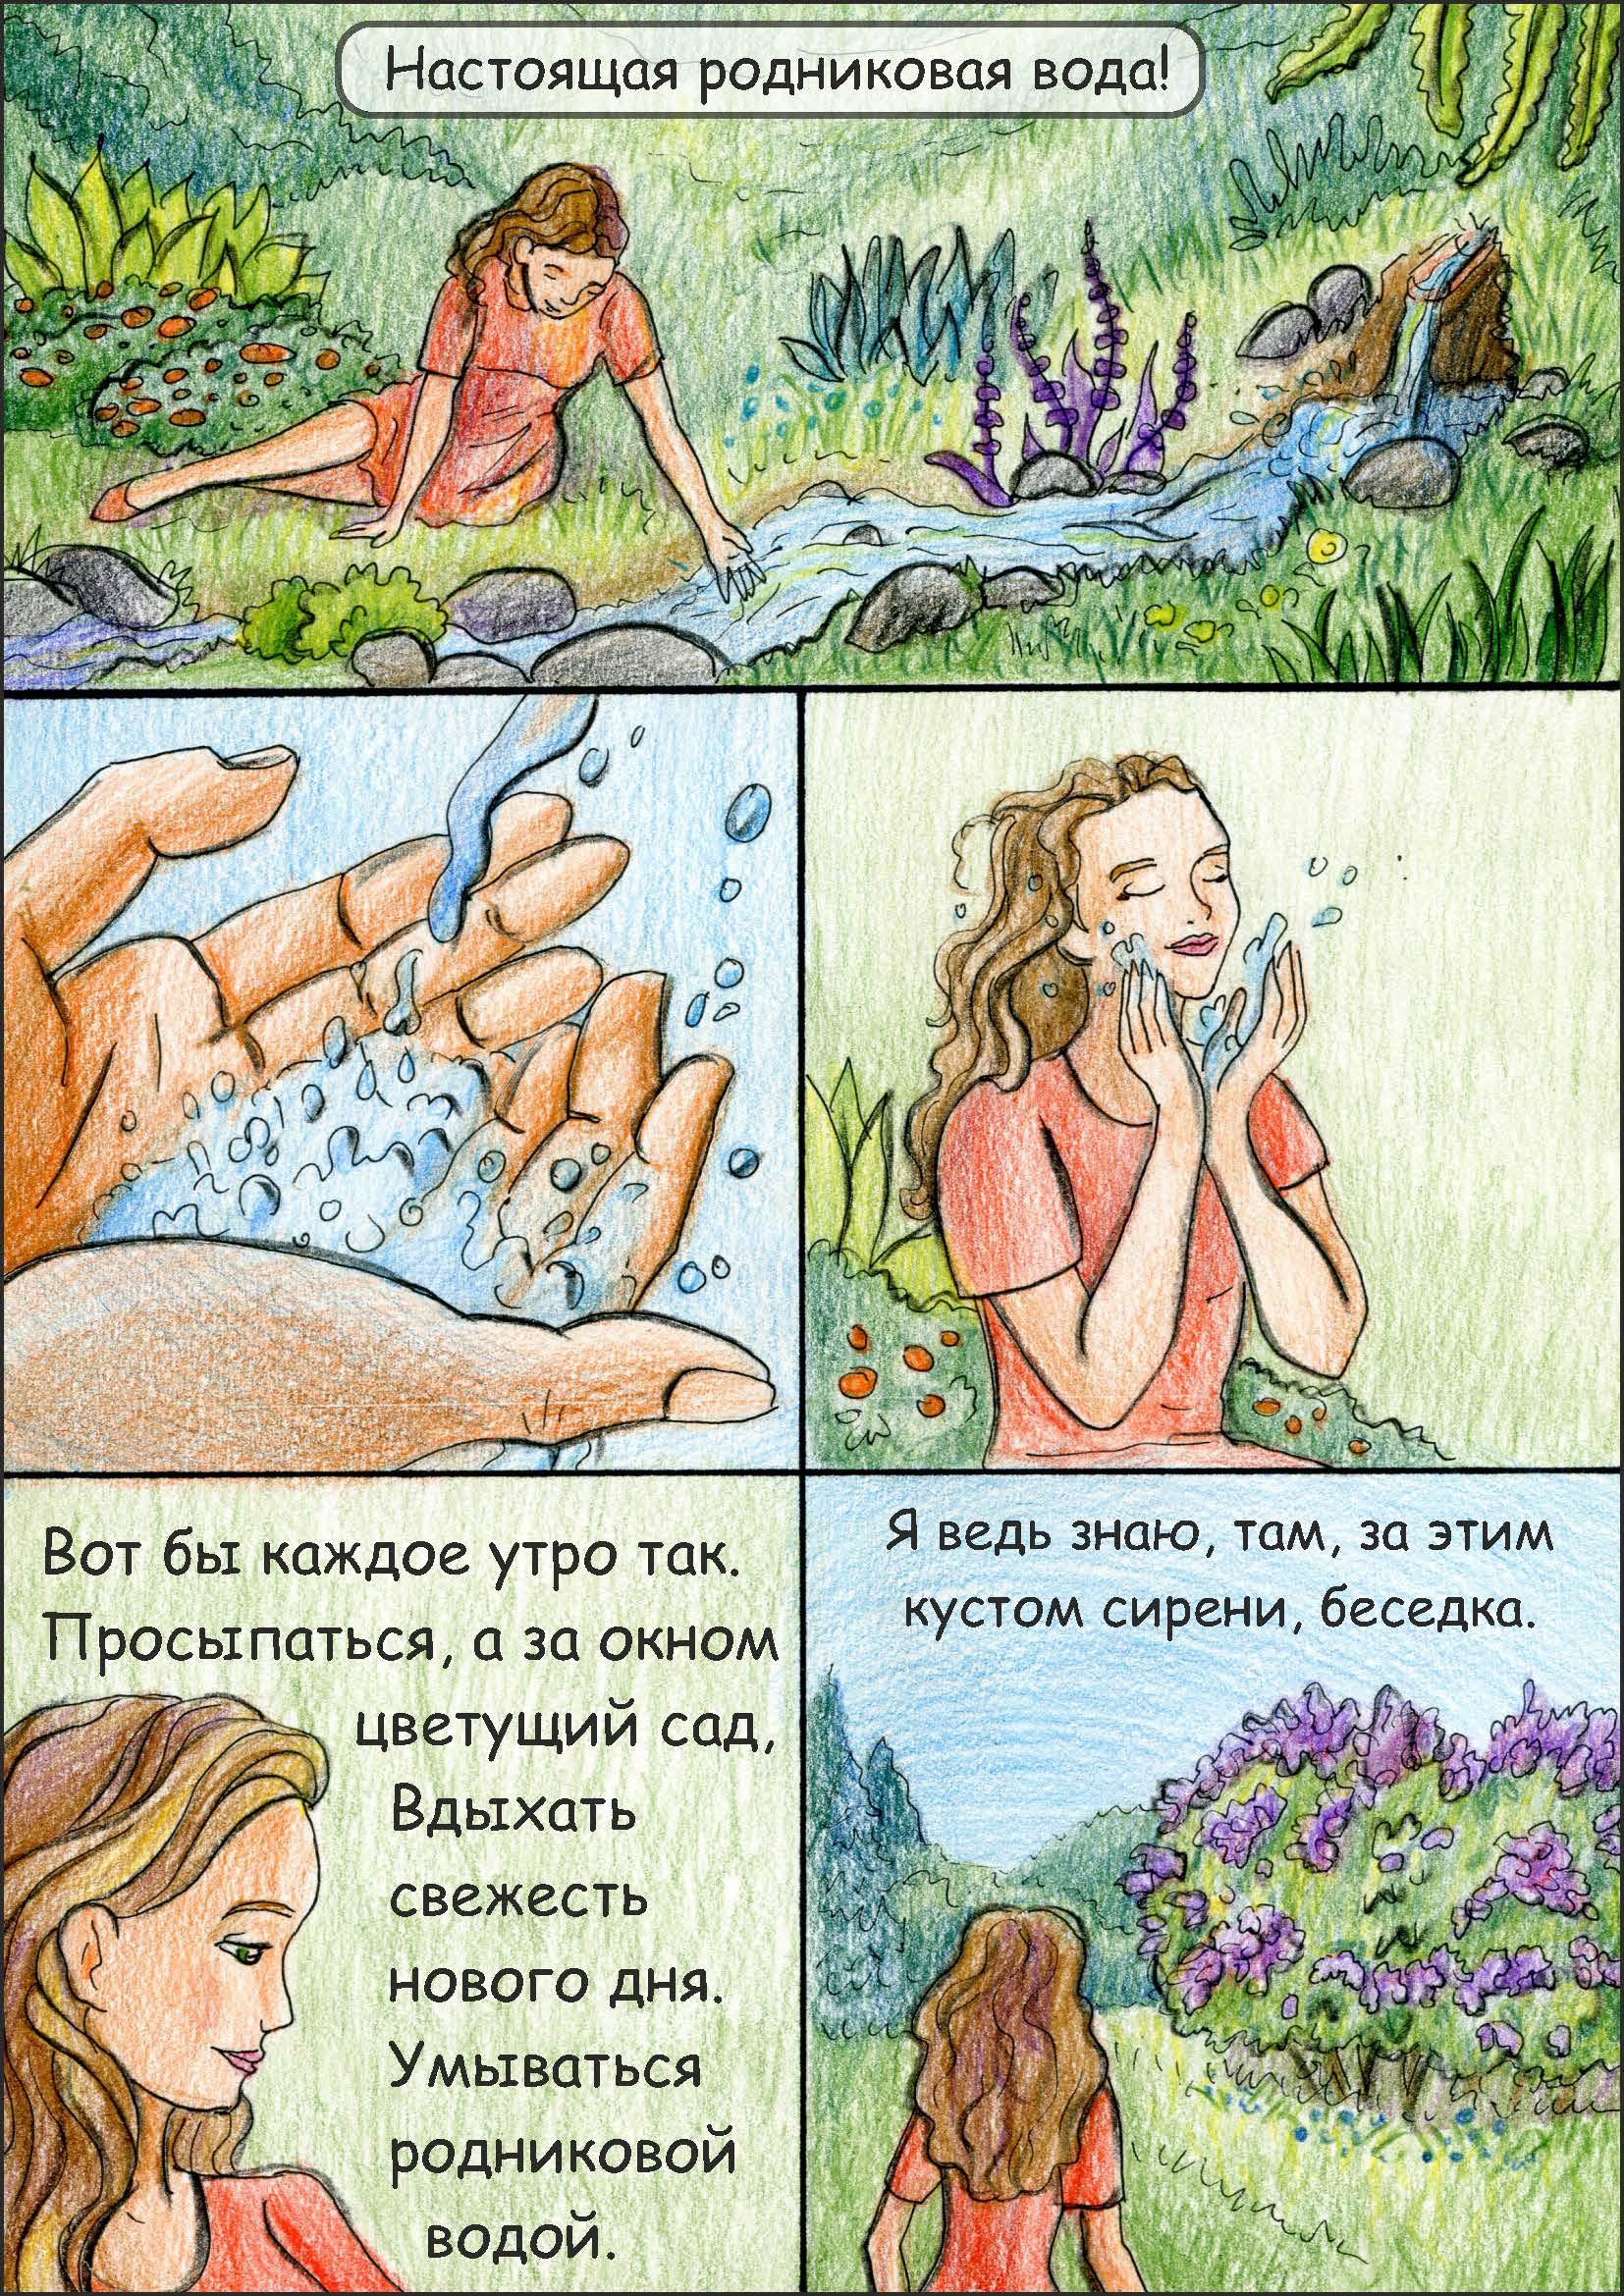 Анна Гейдебрехт. Комикс Зовущая мечта (11).jpg